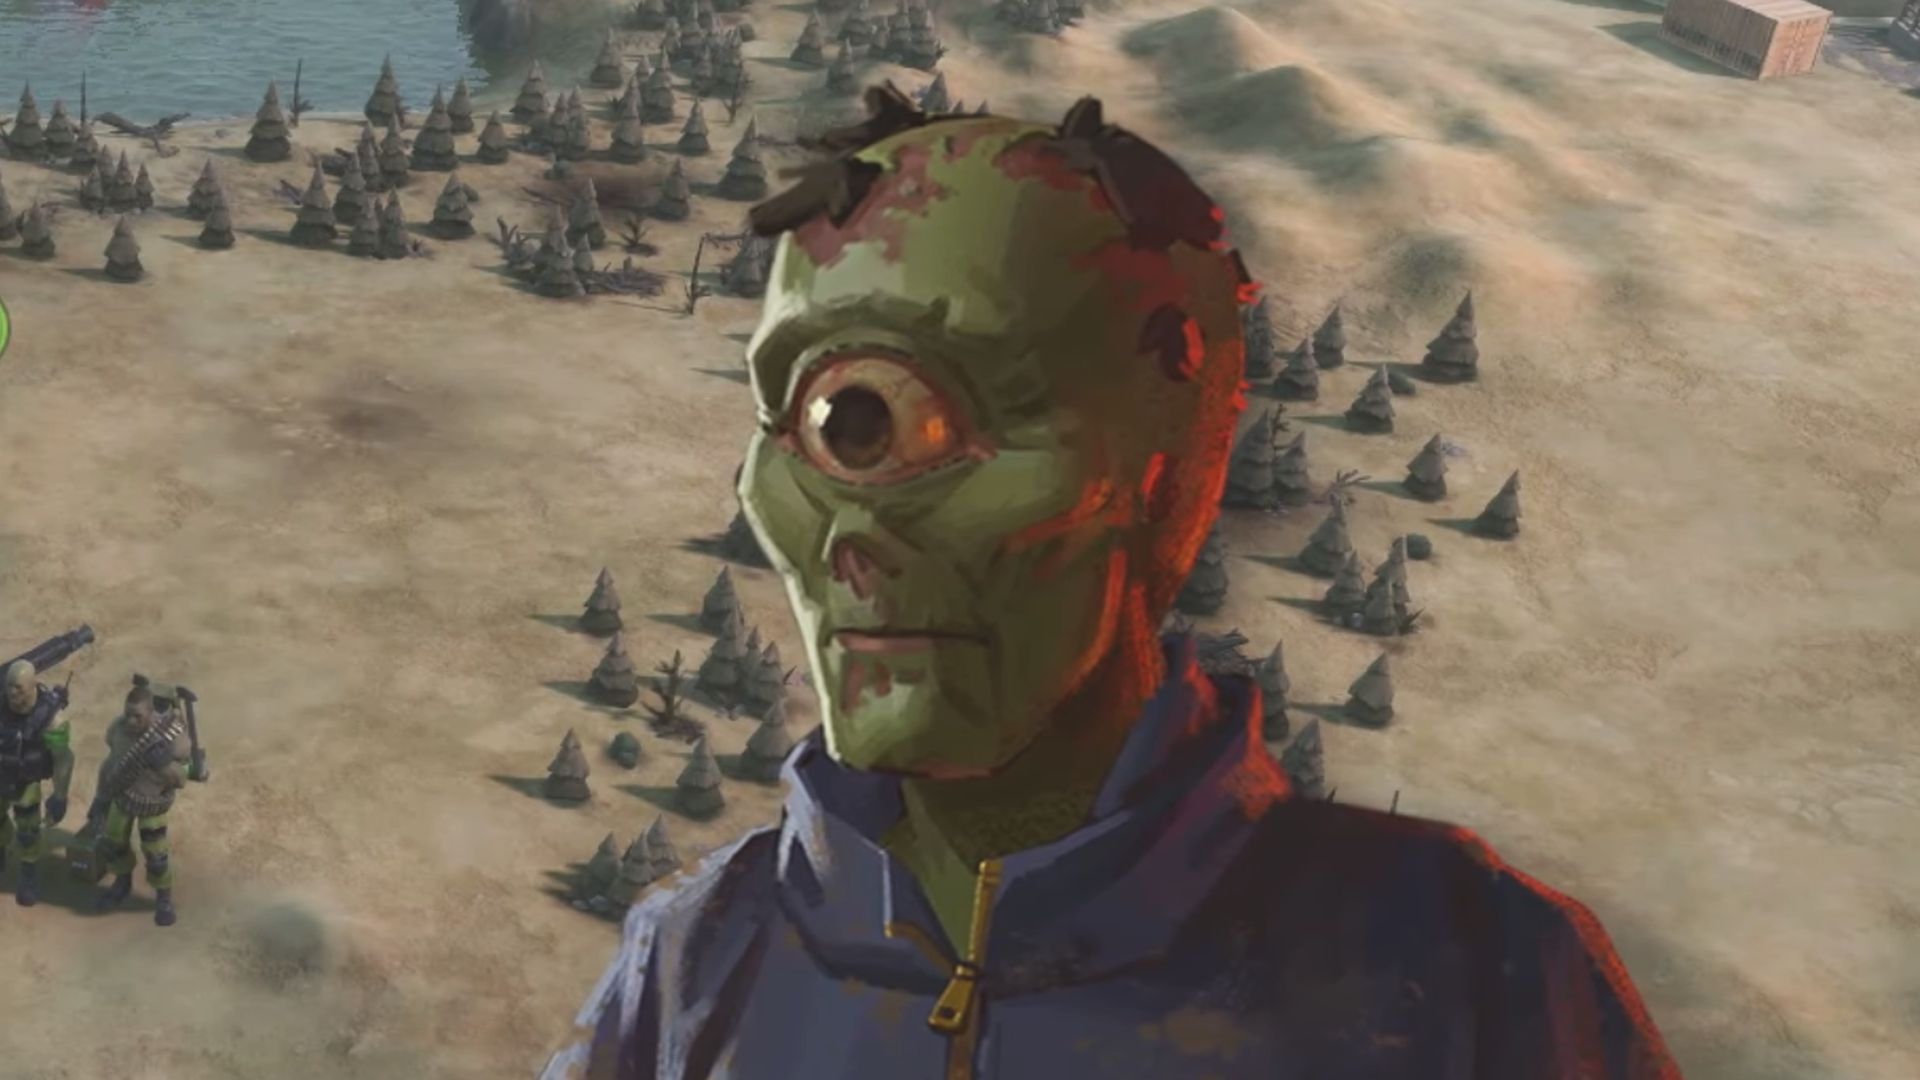 Civilization 6's battle royale is an April Fools' that got out of hand